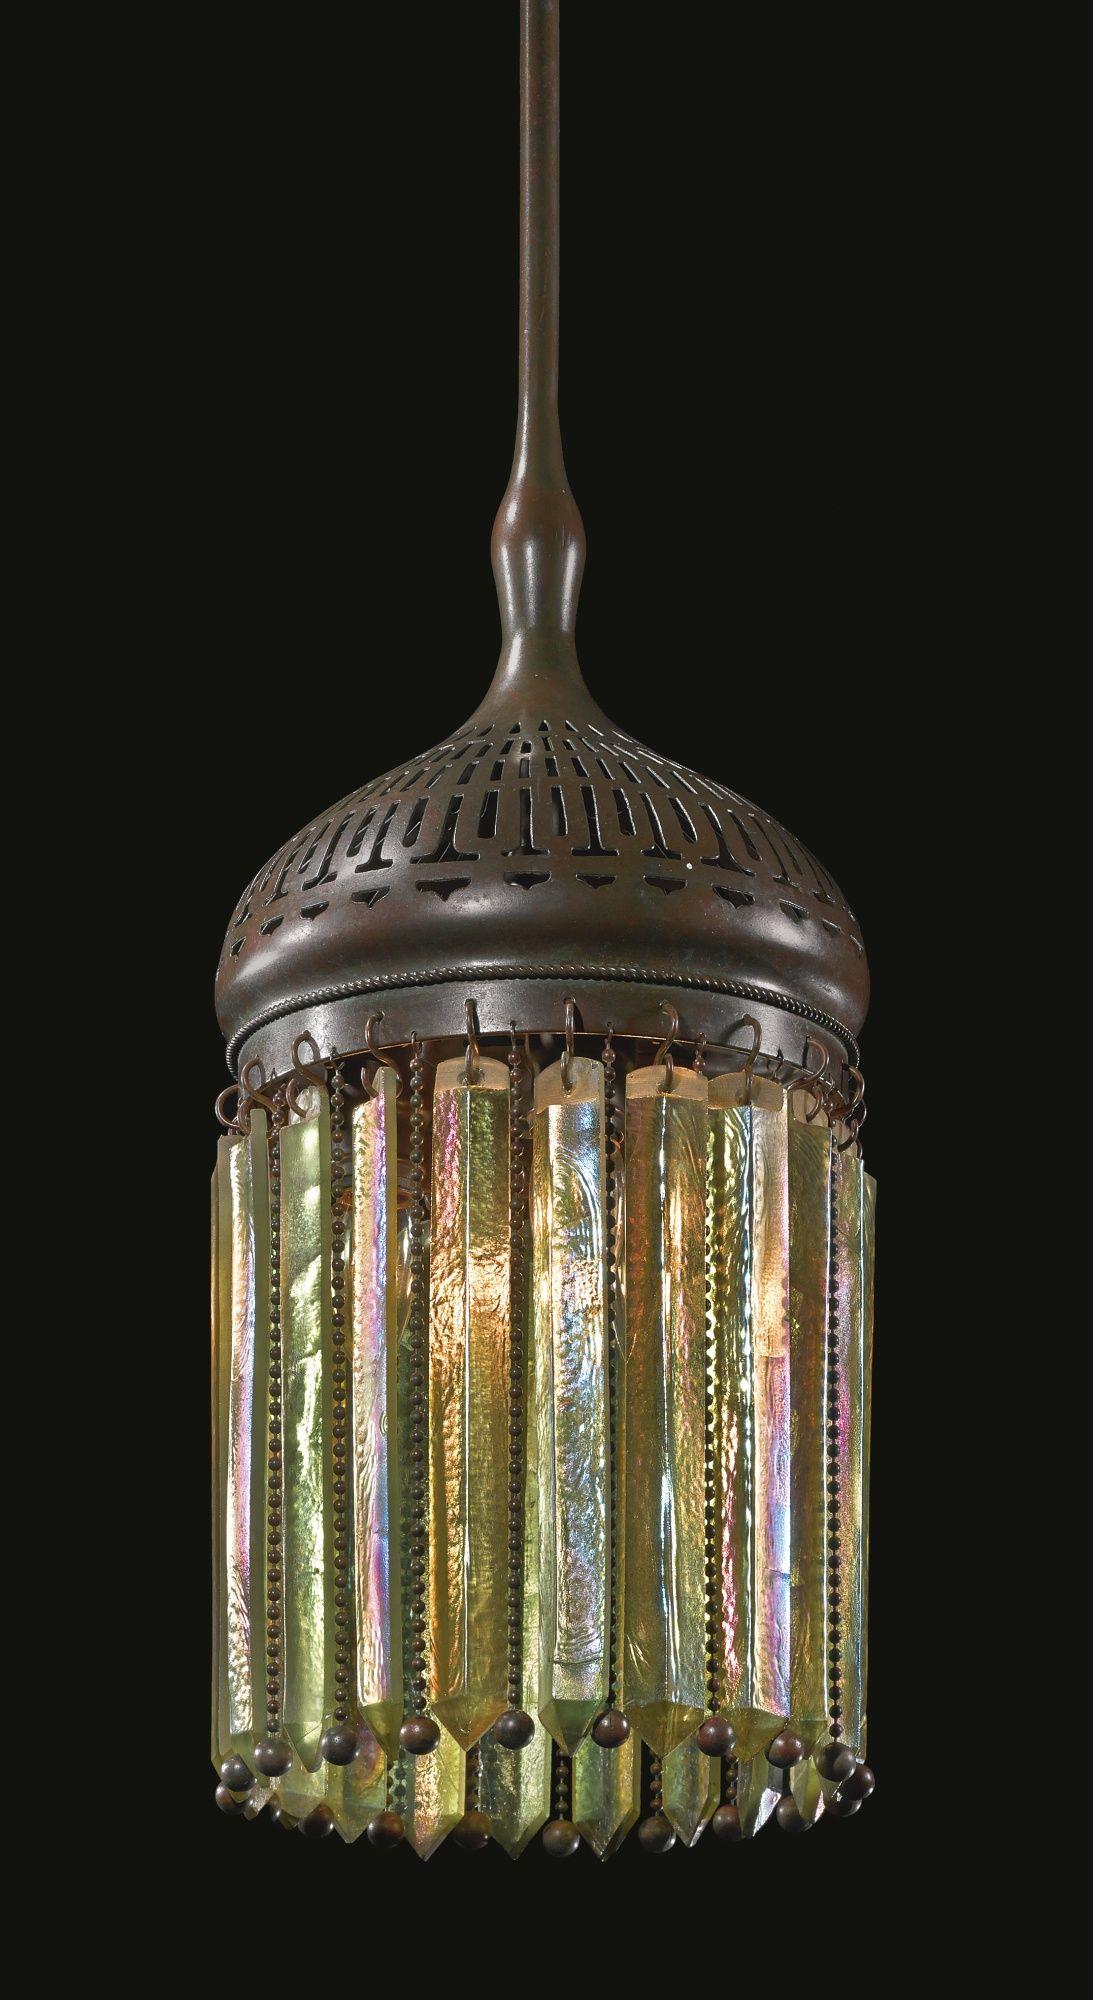 Tiffany studios moorish prism lantern circa 1905 ideae tiffany studios moorish prism lantern circa 1905 ideae aloadofball Gallery